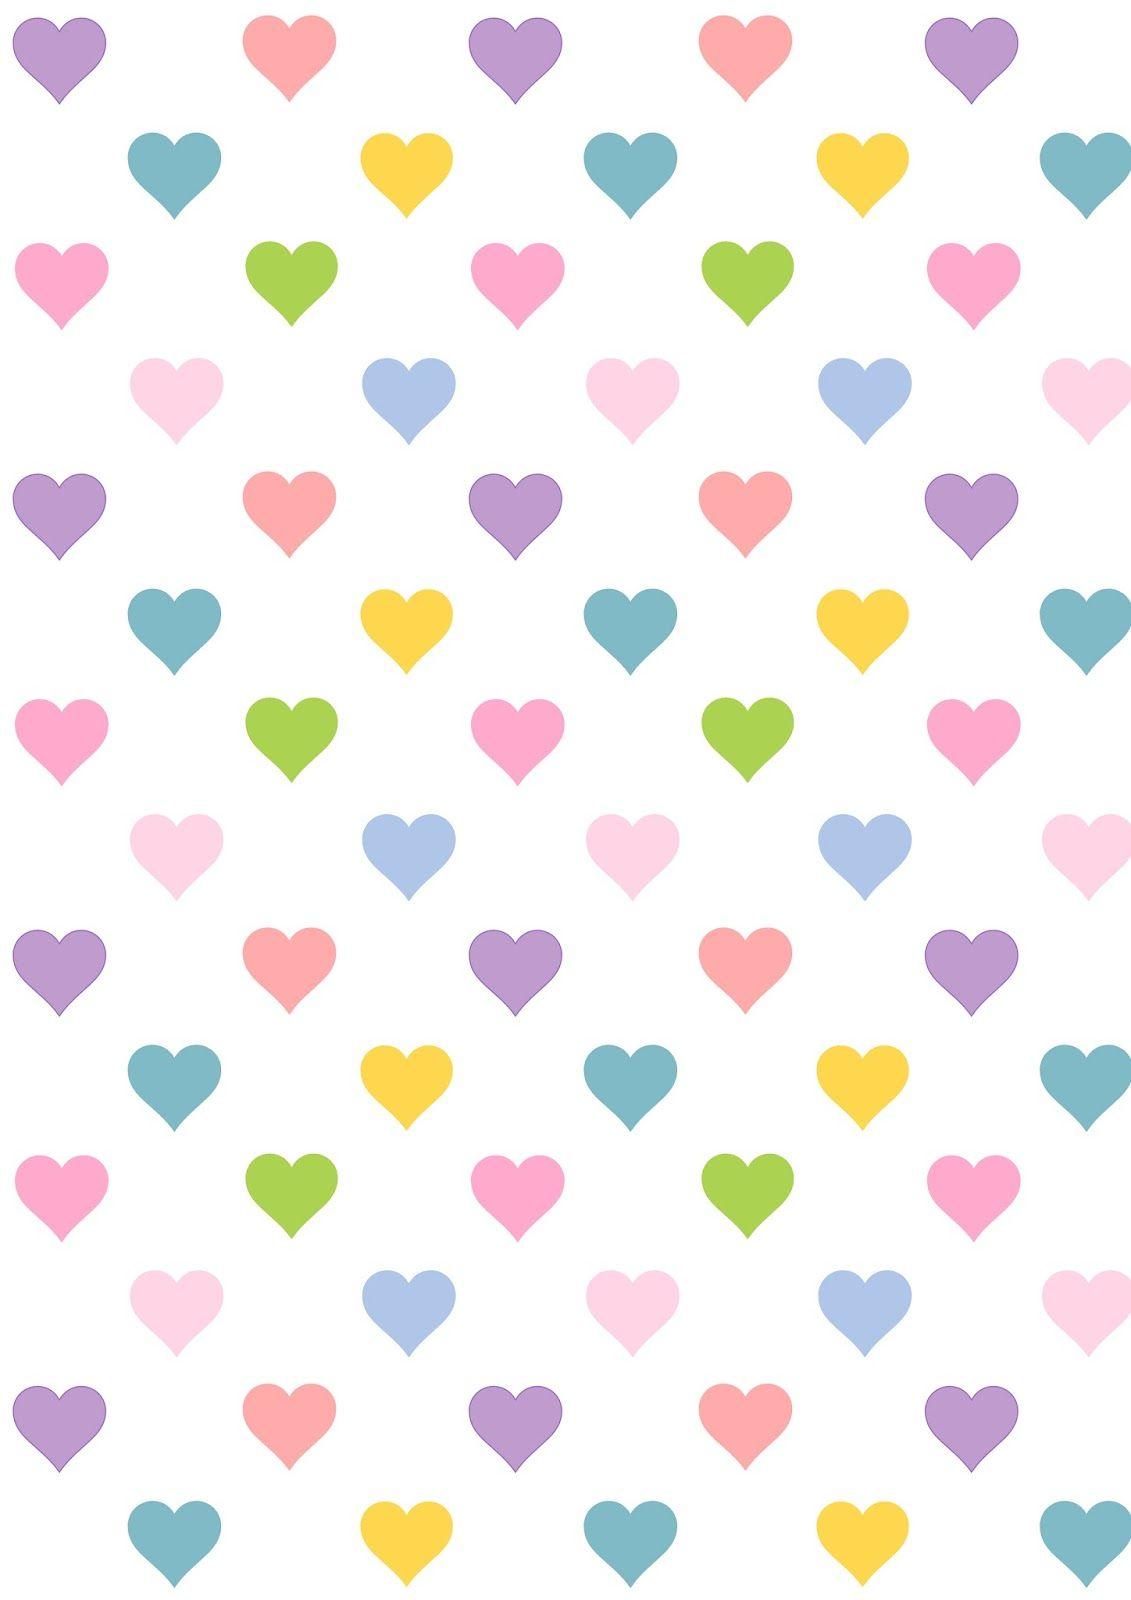 Free digital heart scrapbooking paper - ausdruckbares Geschenkpapier - freebie